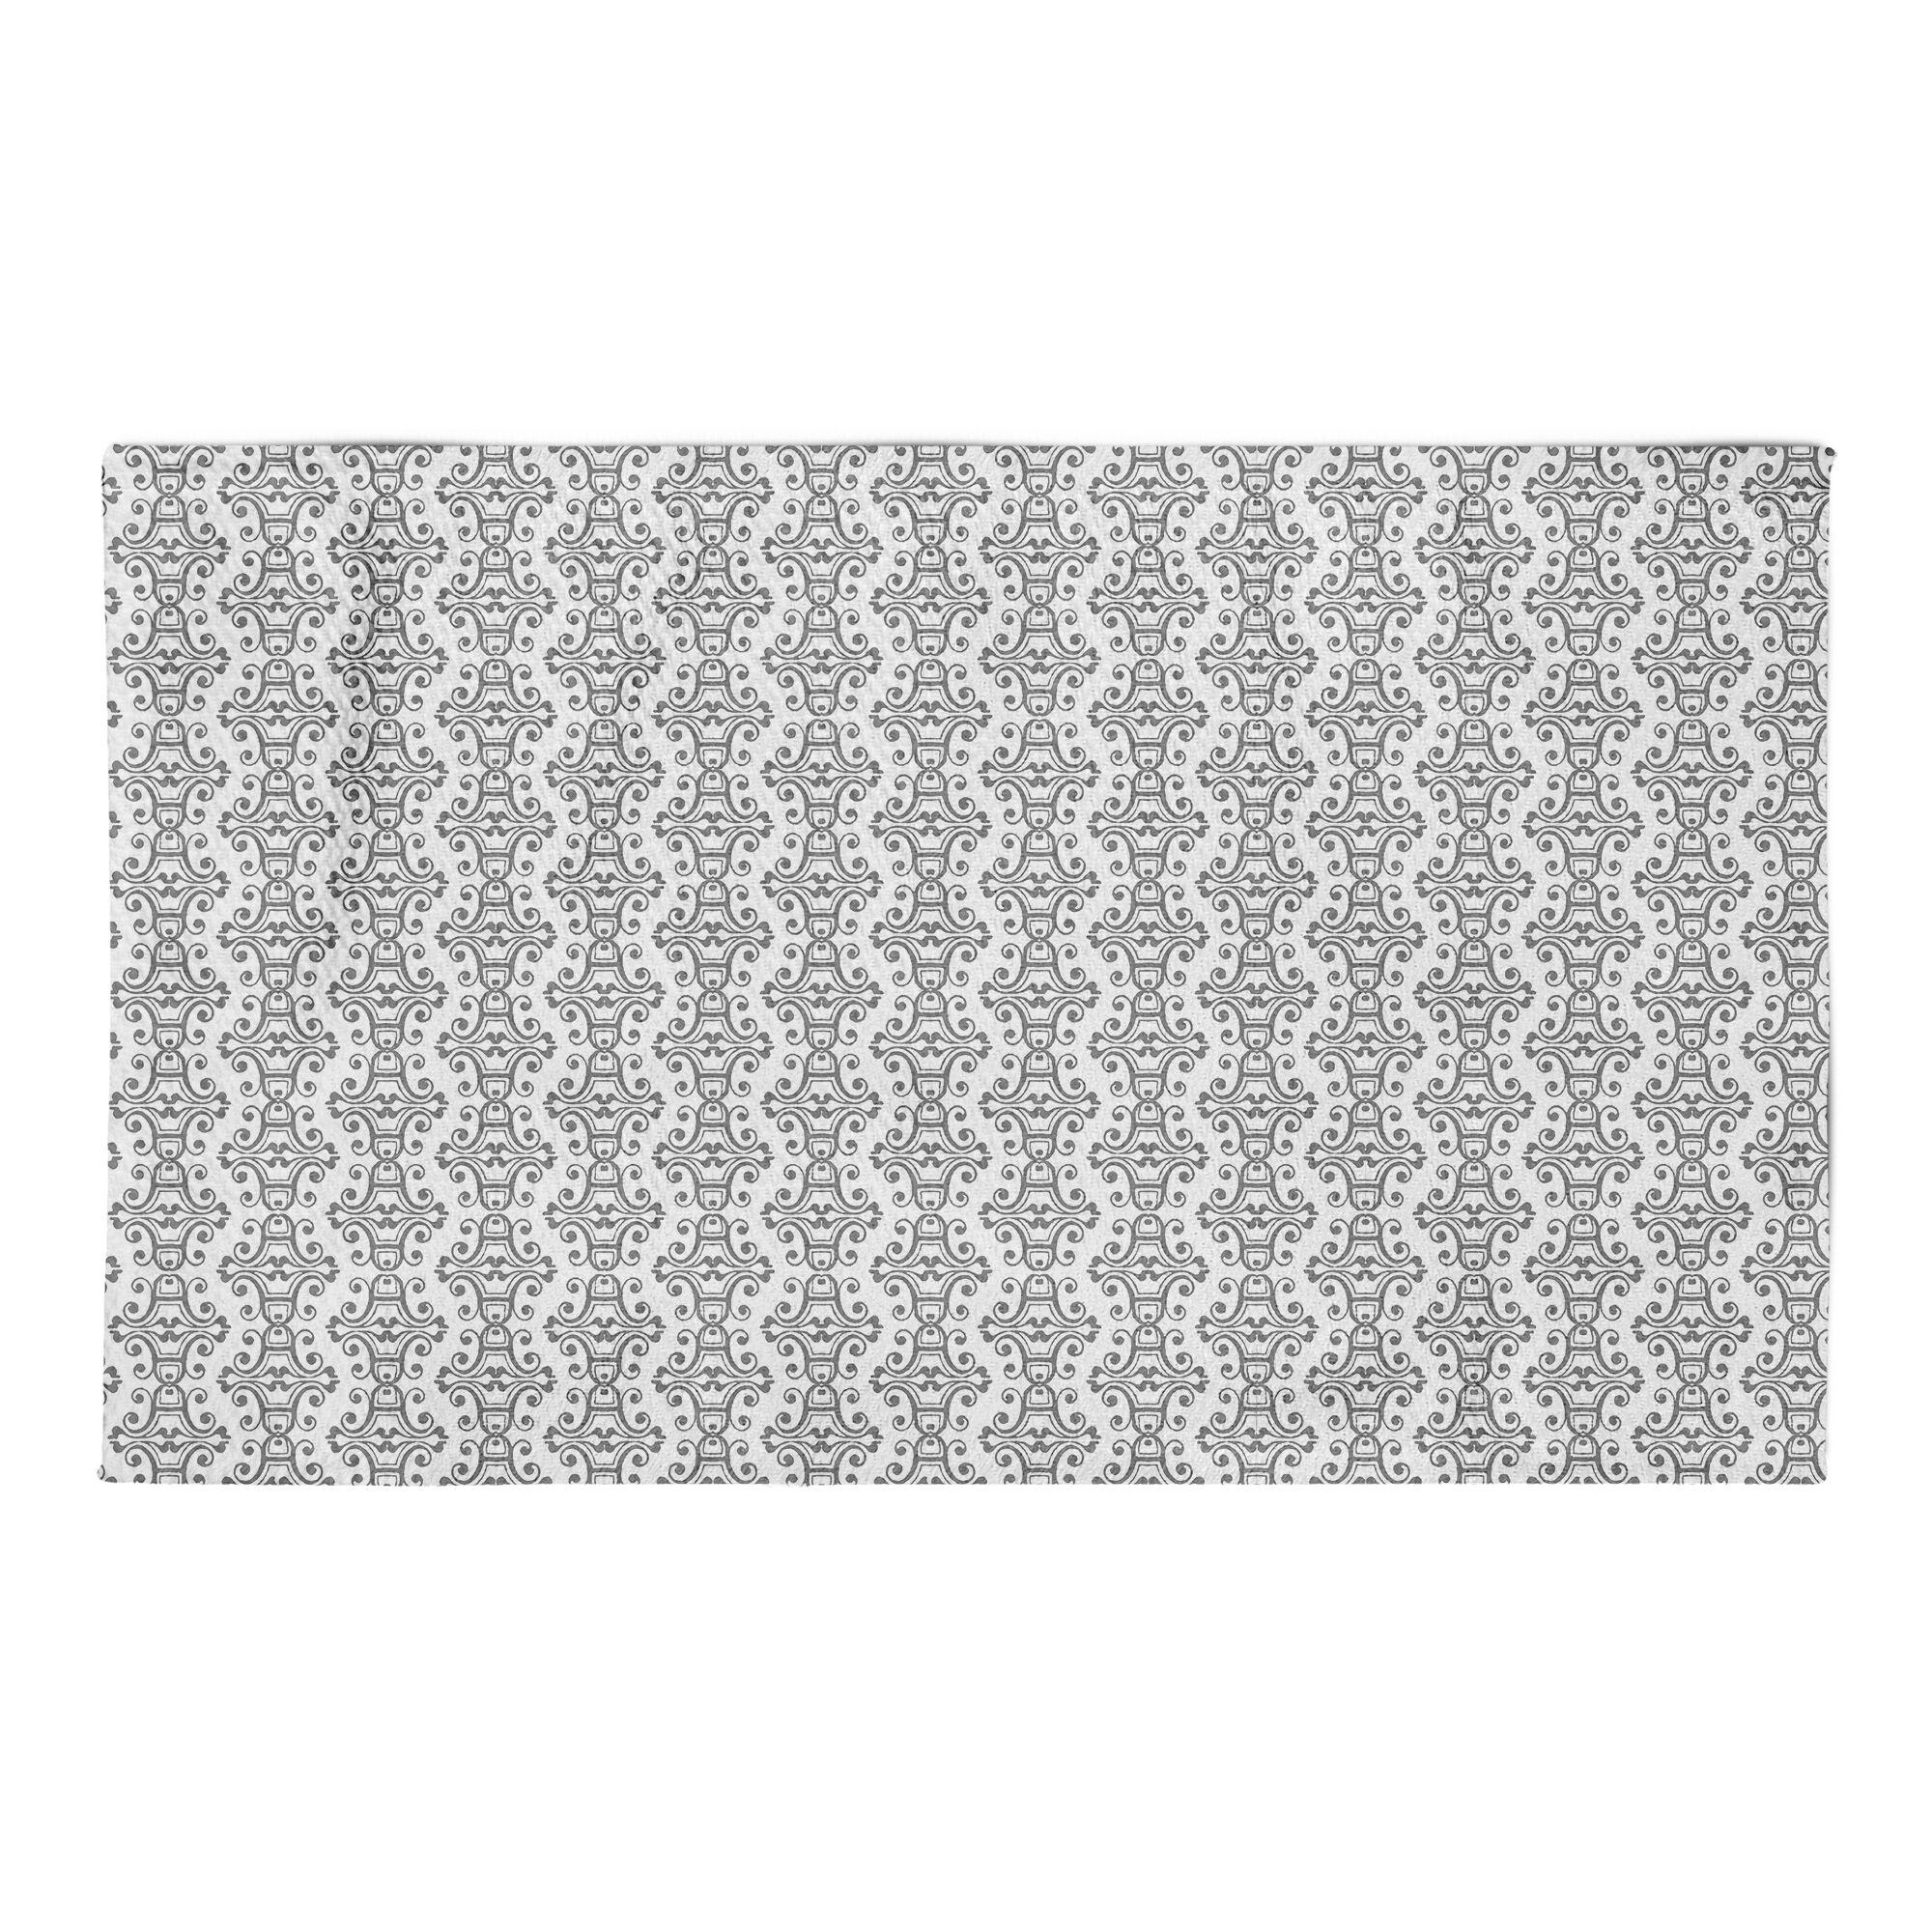 Kennison Gray Area Rug Rug Size: 3' x 5'